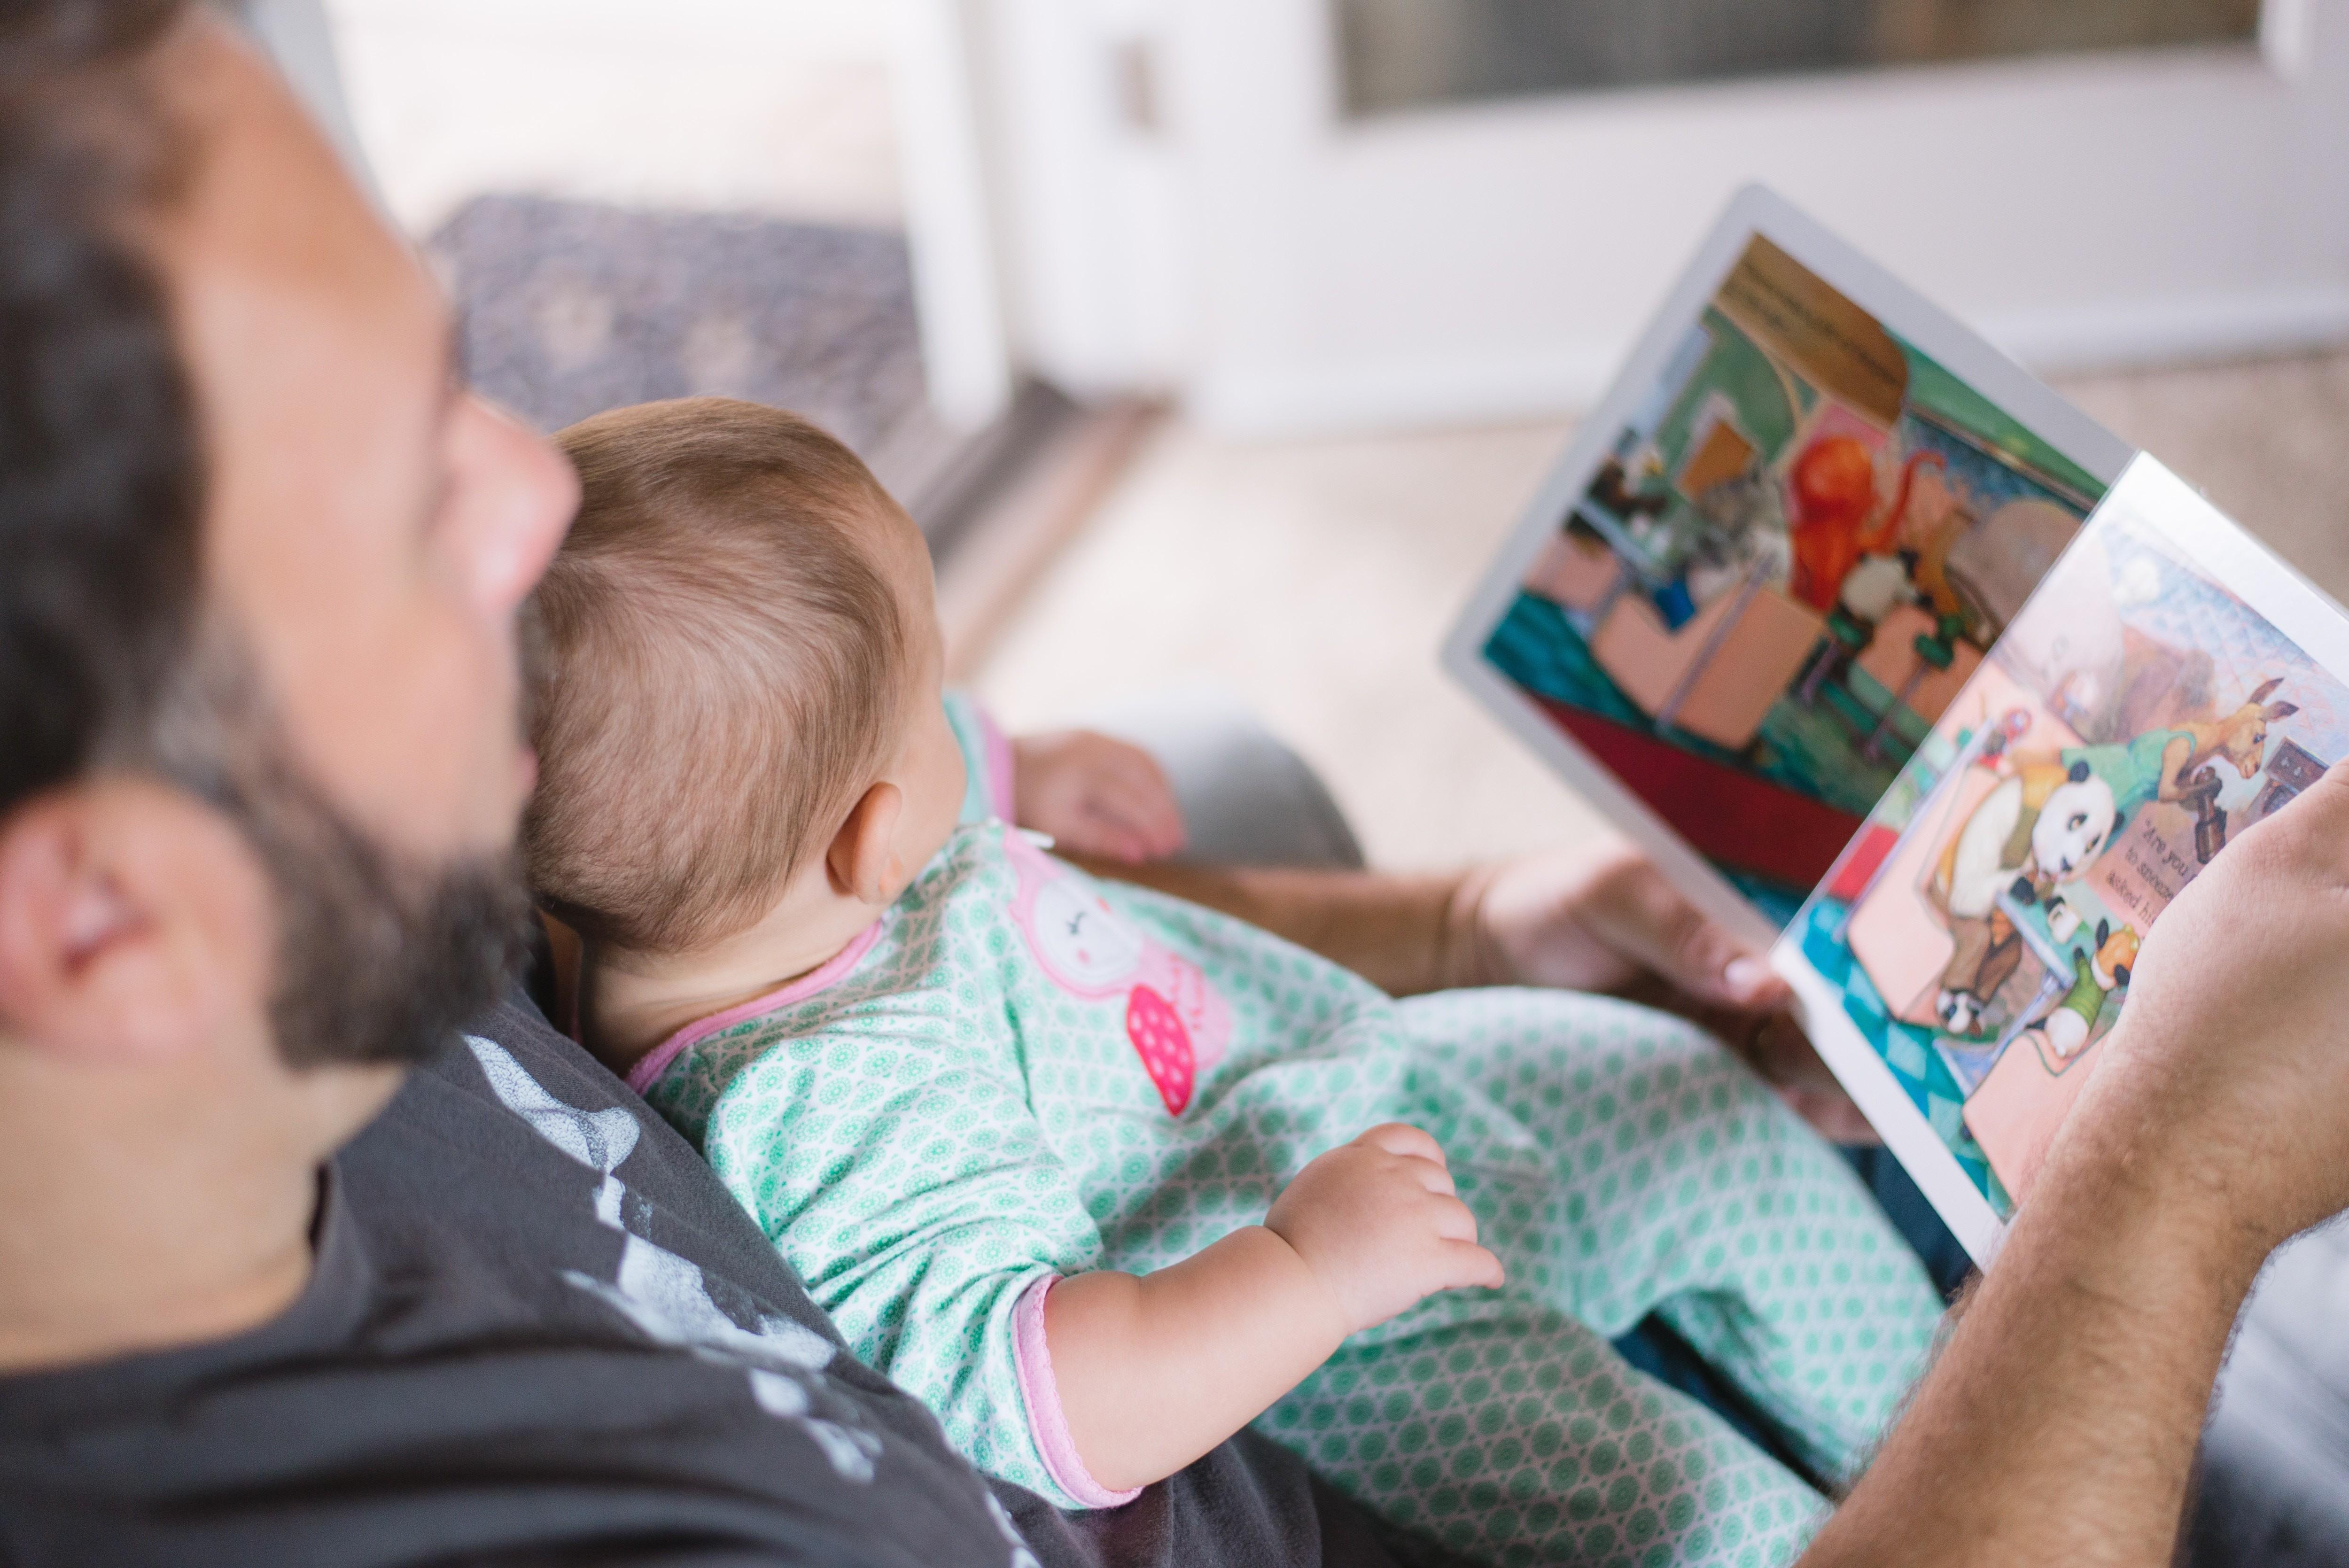 Leia para seu filho (Foto: Picsea para Unsplash)